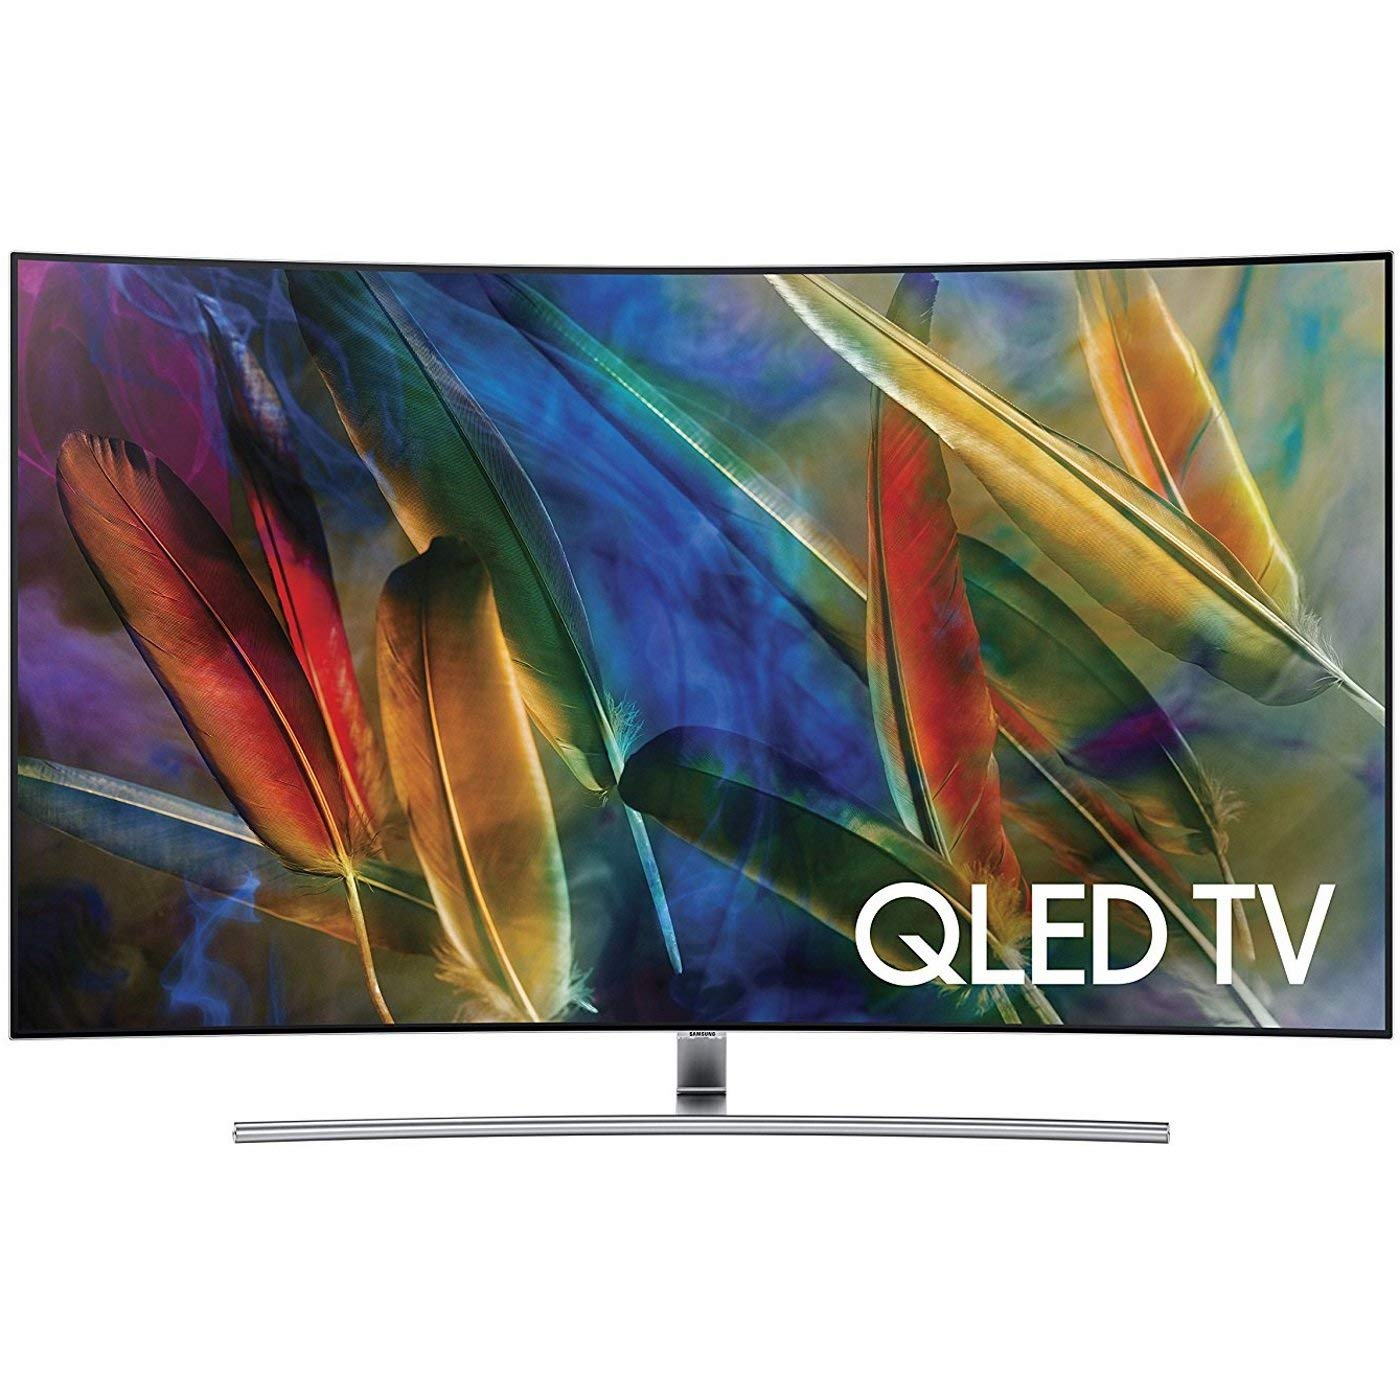 An image of Samsung QN65Q7CAMFXZA 65-Inch HDR Curved 4K QLED 240Hz TV